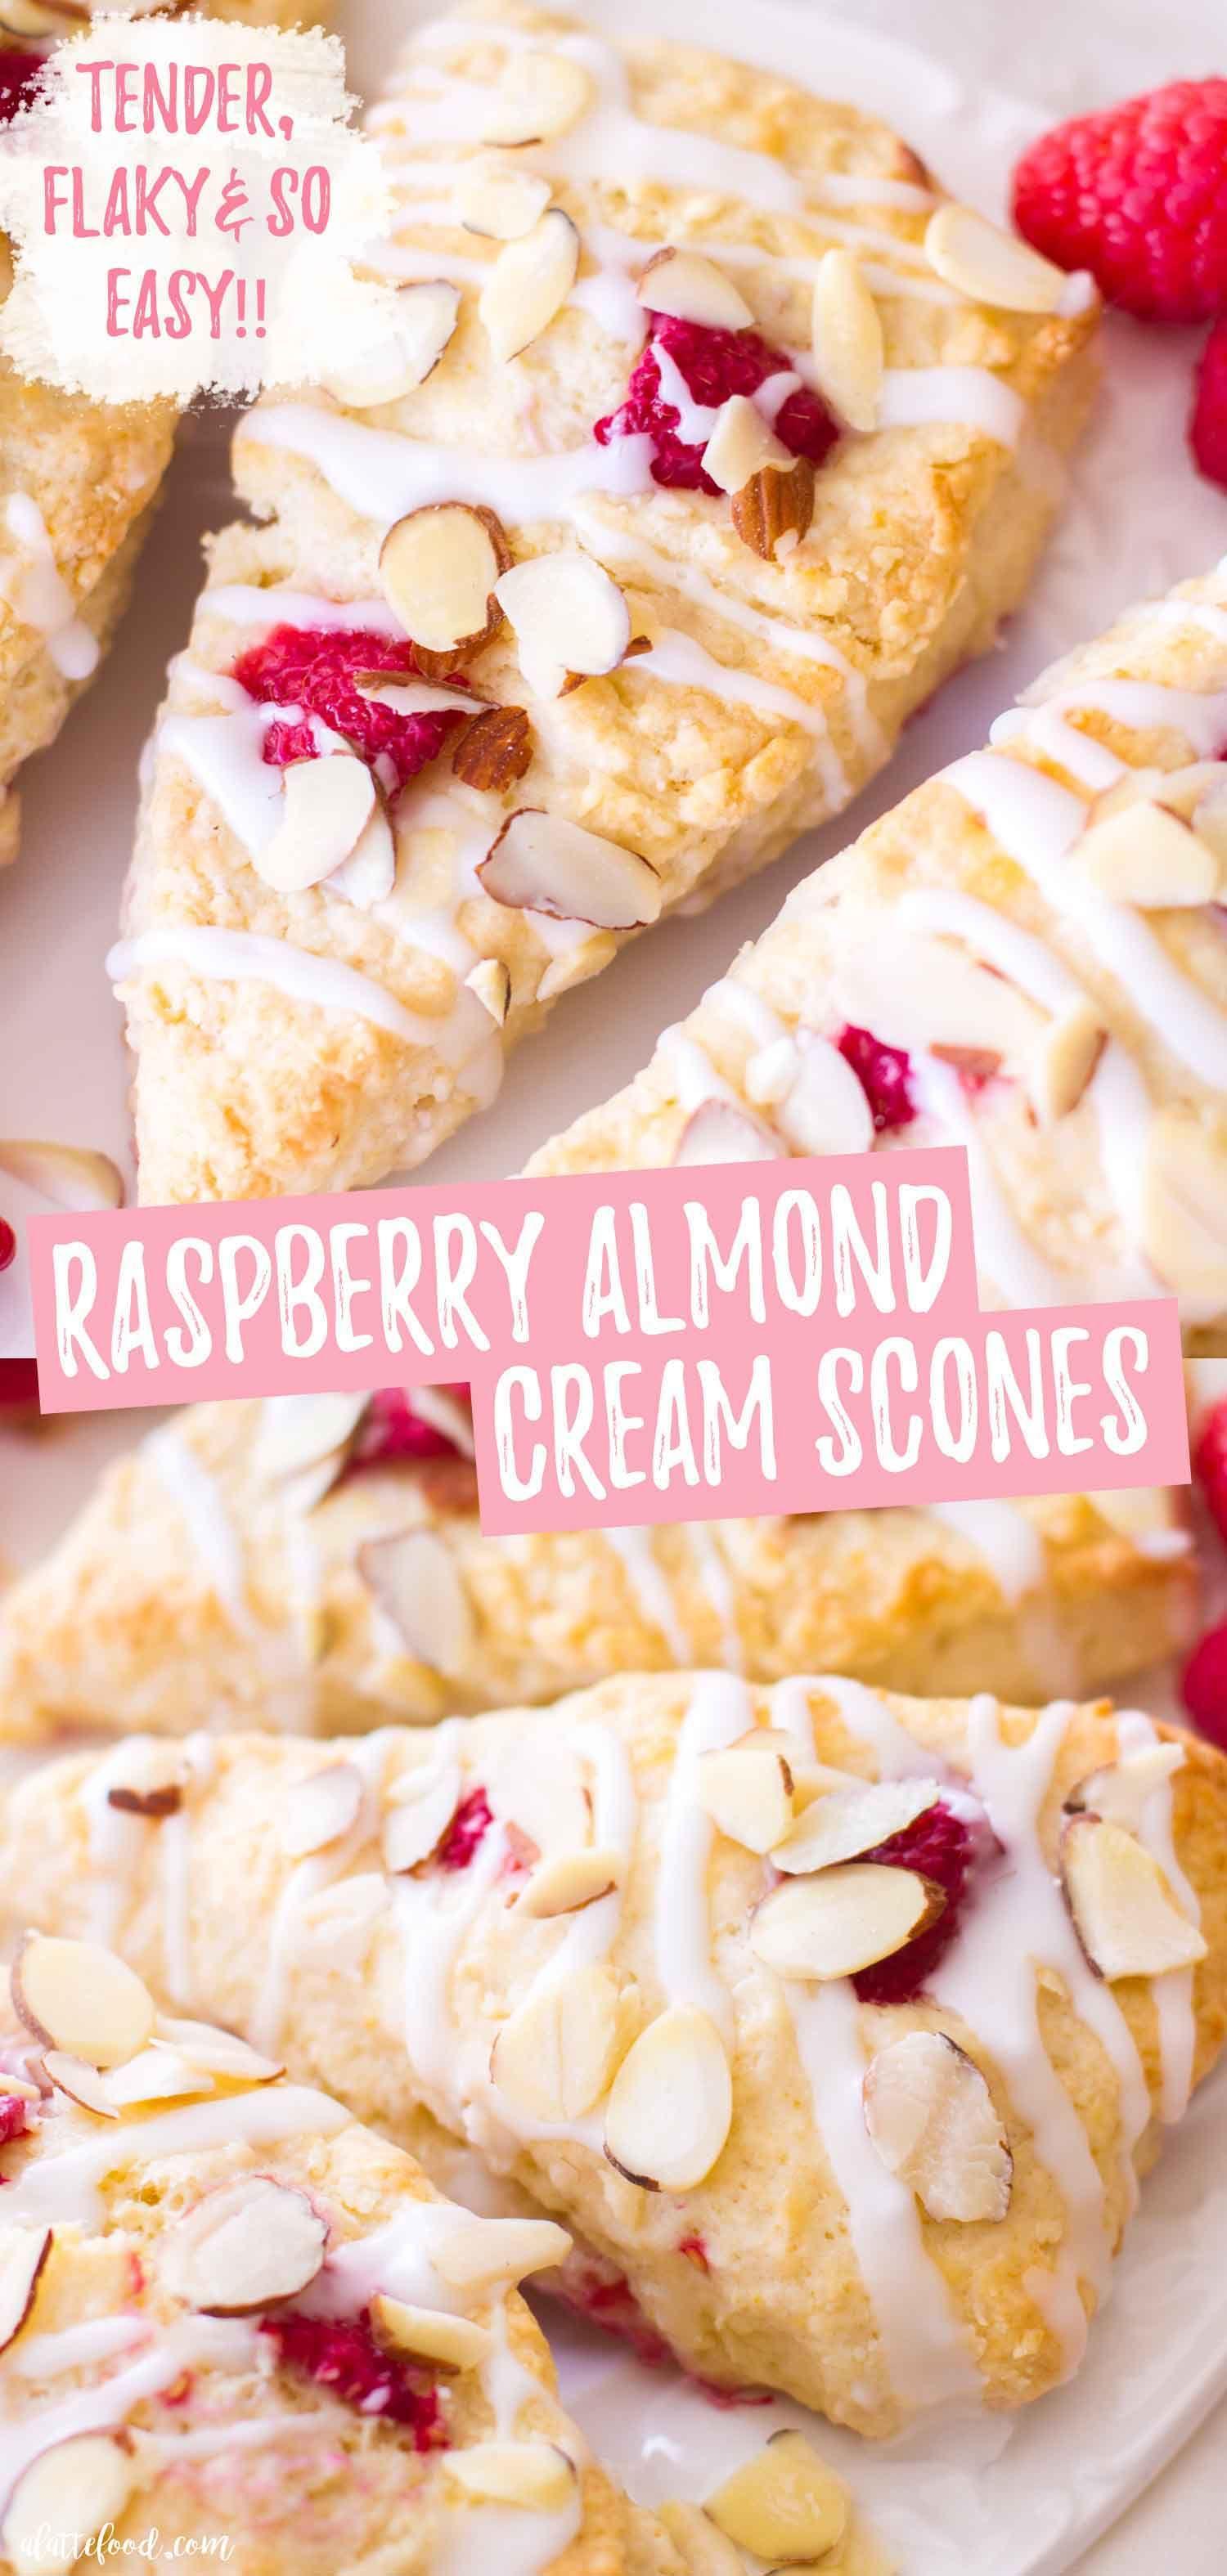 Raspberry Almond Cream Scones In 2020 Scones Recipe Easy Scones Easy Homemade Scones